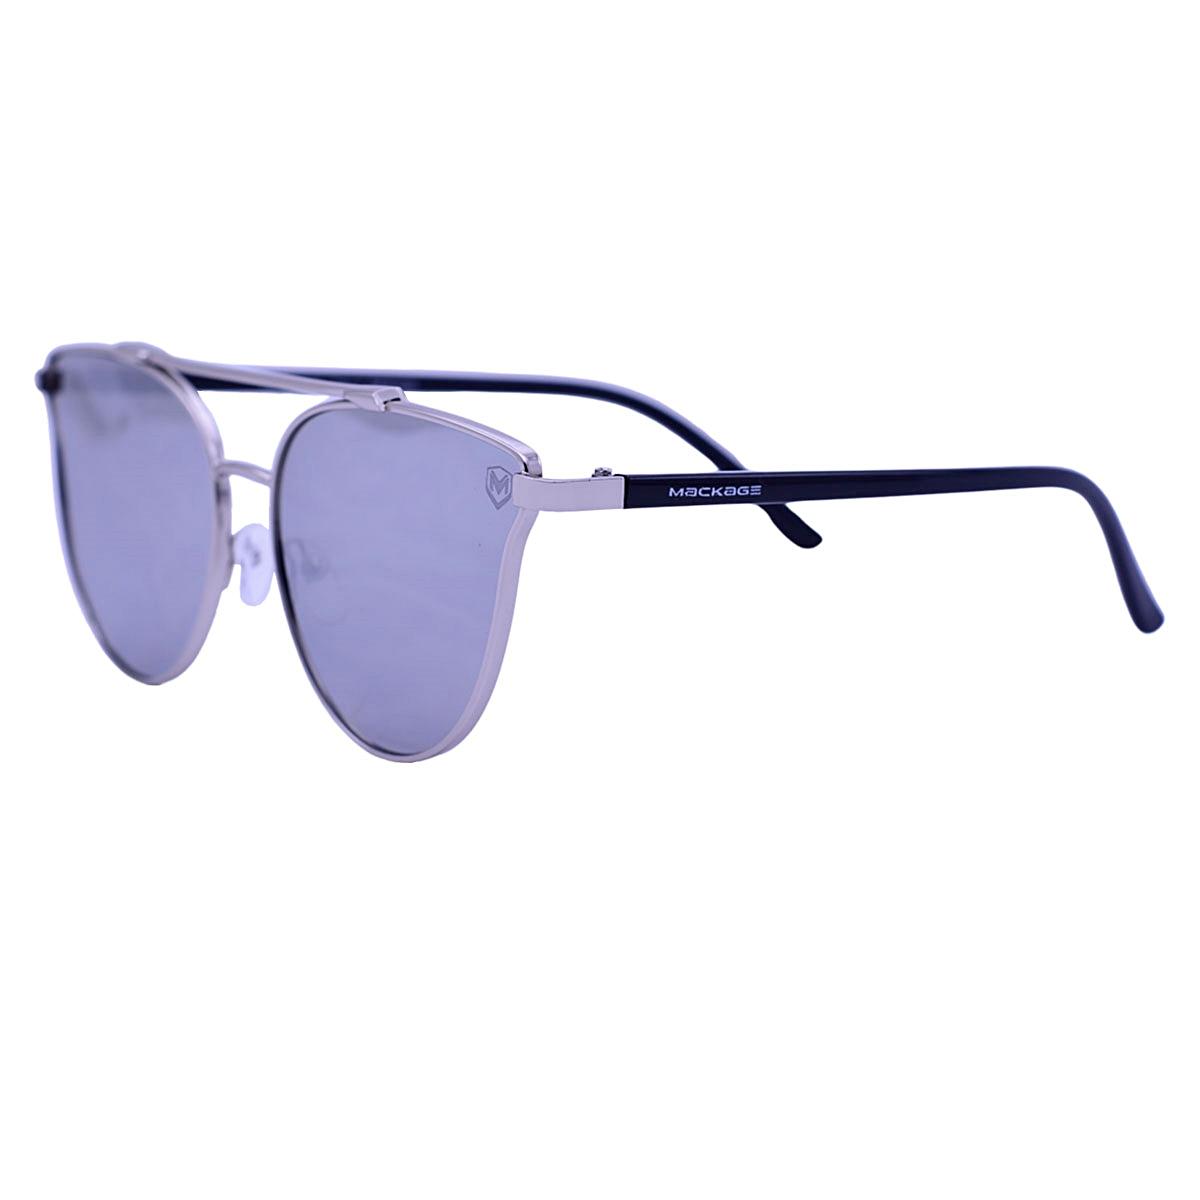 Óculos de Sol Mackage Metal/Acetato Feminino Gateado - Dourado/Prata